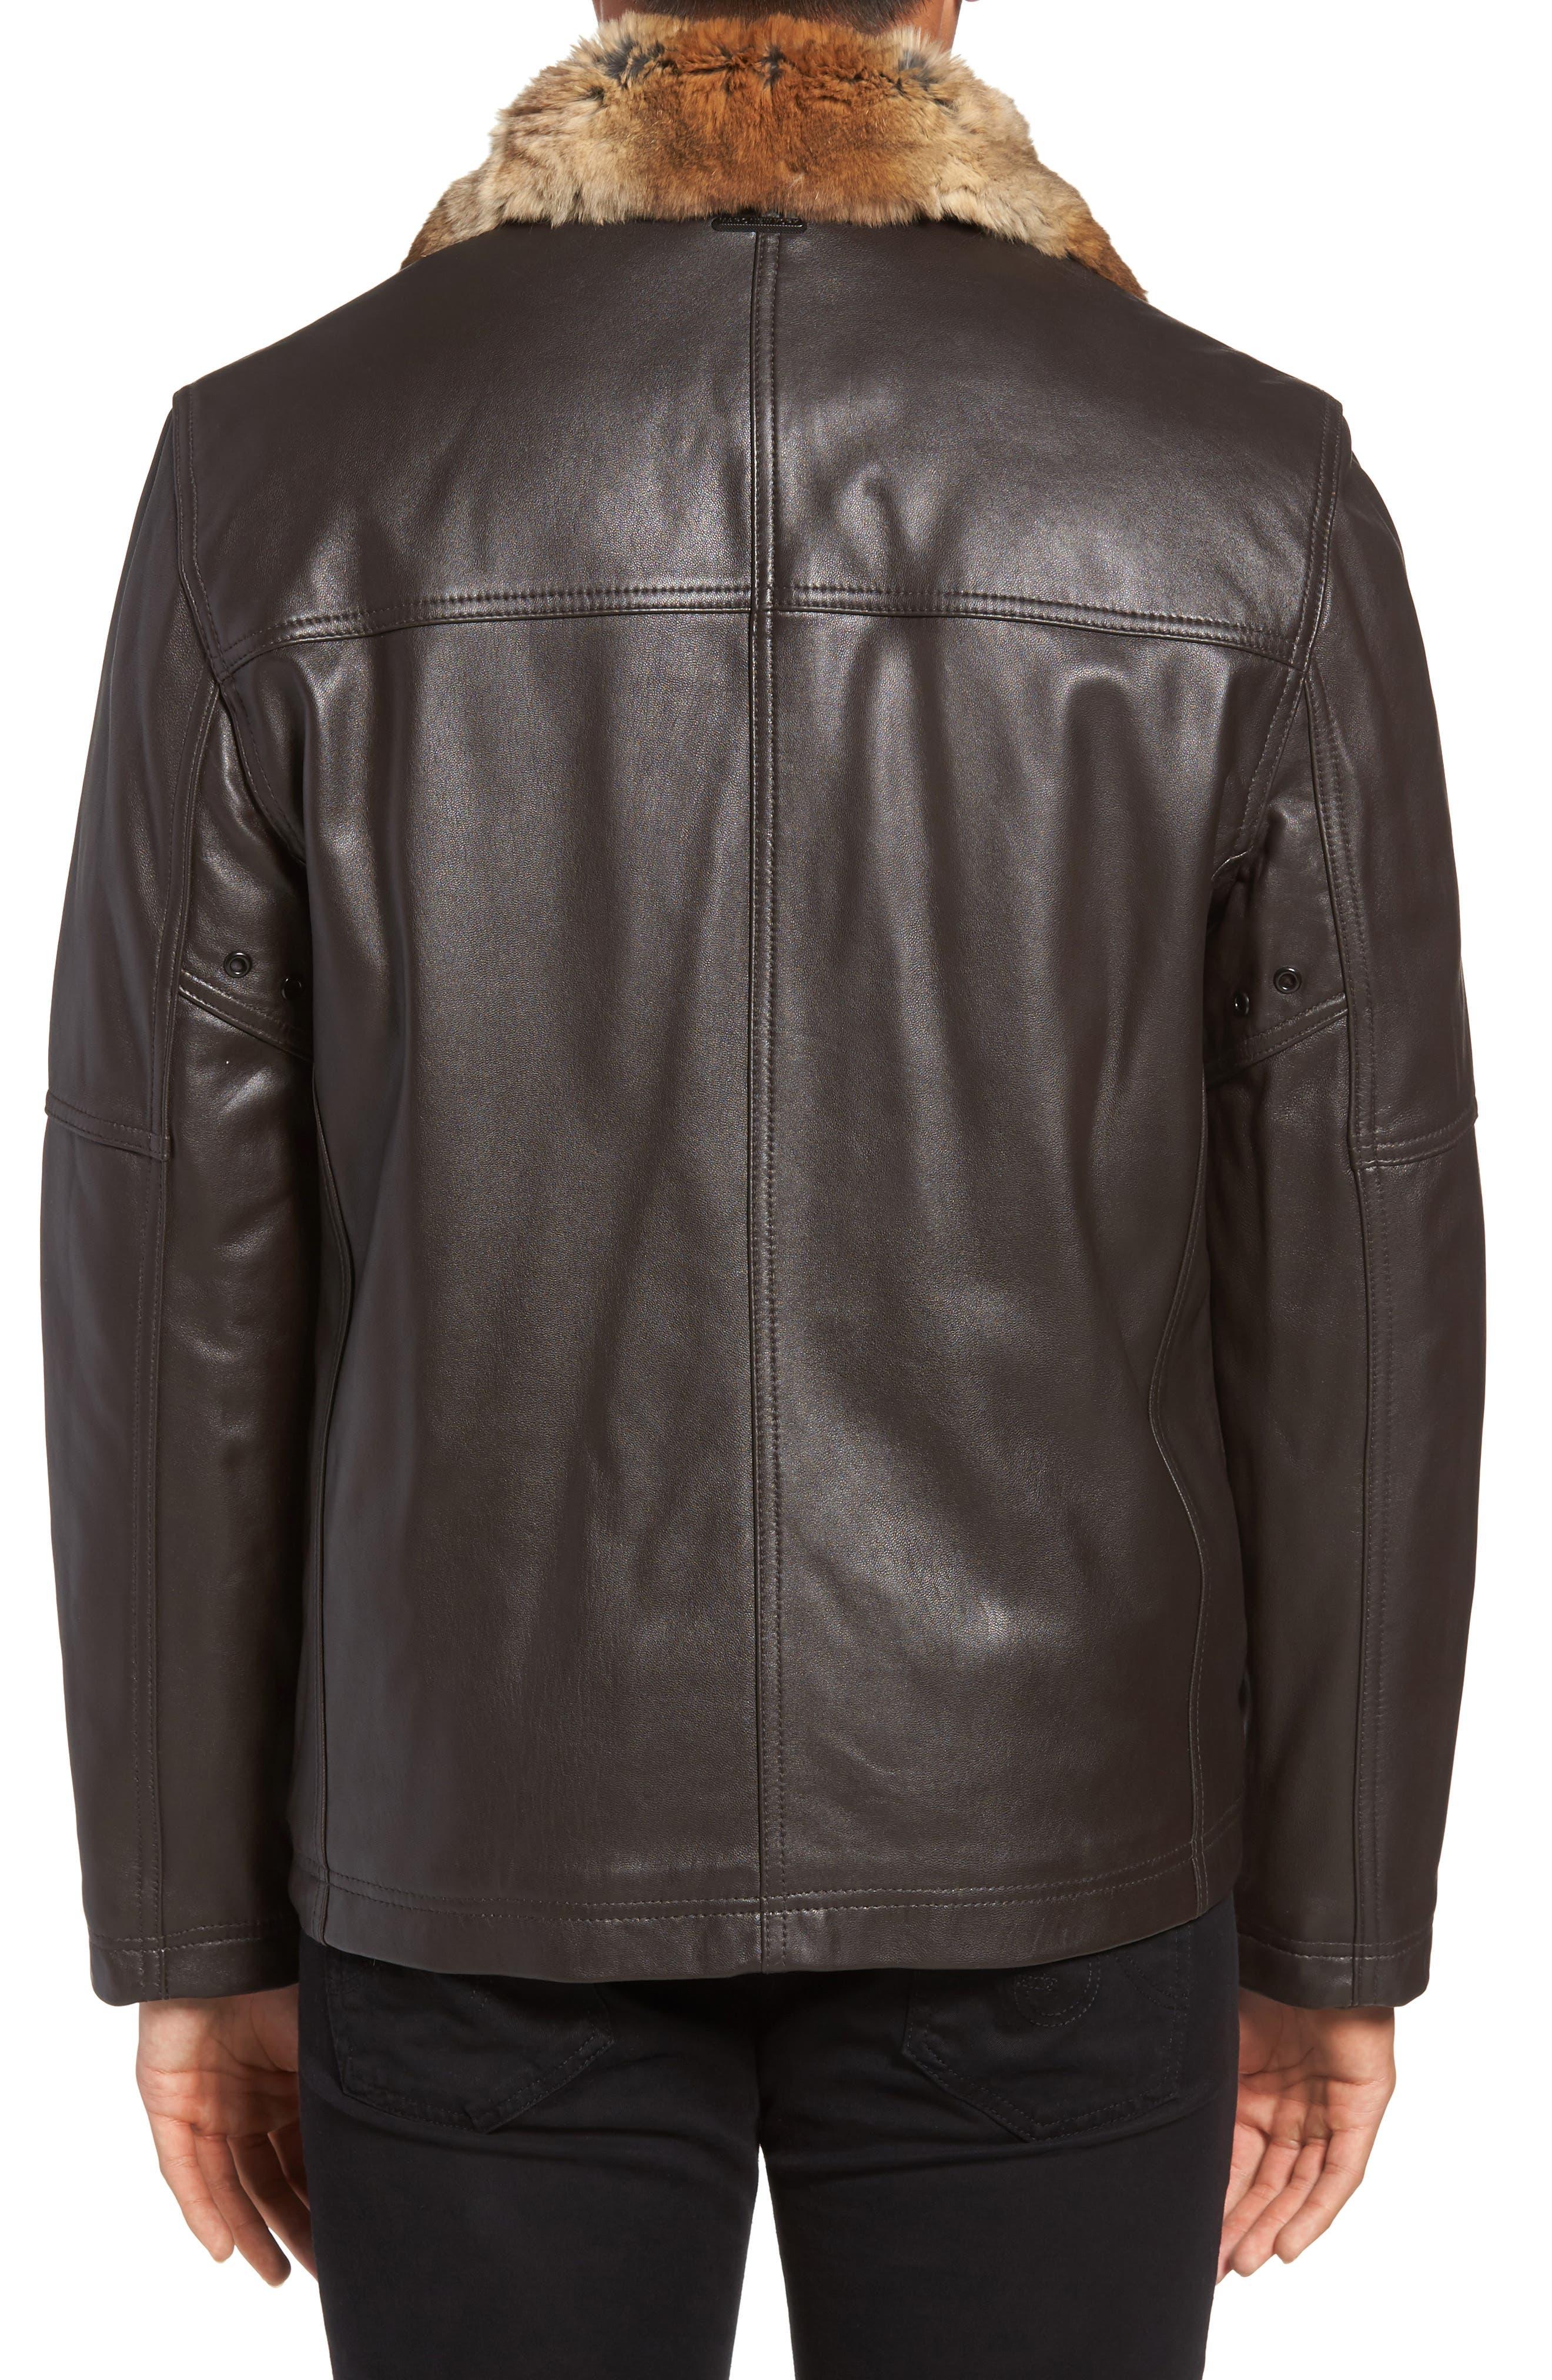 Lambskin Leather Jacket with Genuine Rabbit Fur Trim,                             Alternate thumbnail 4, color,